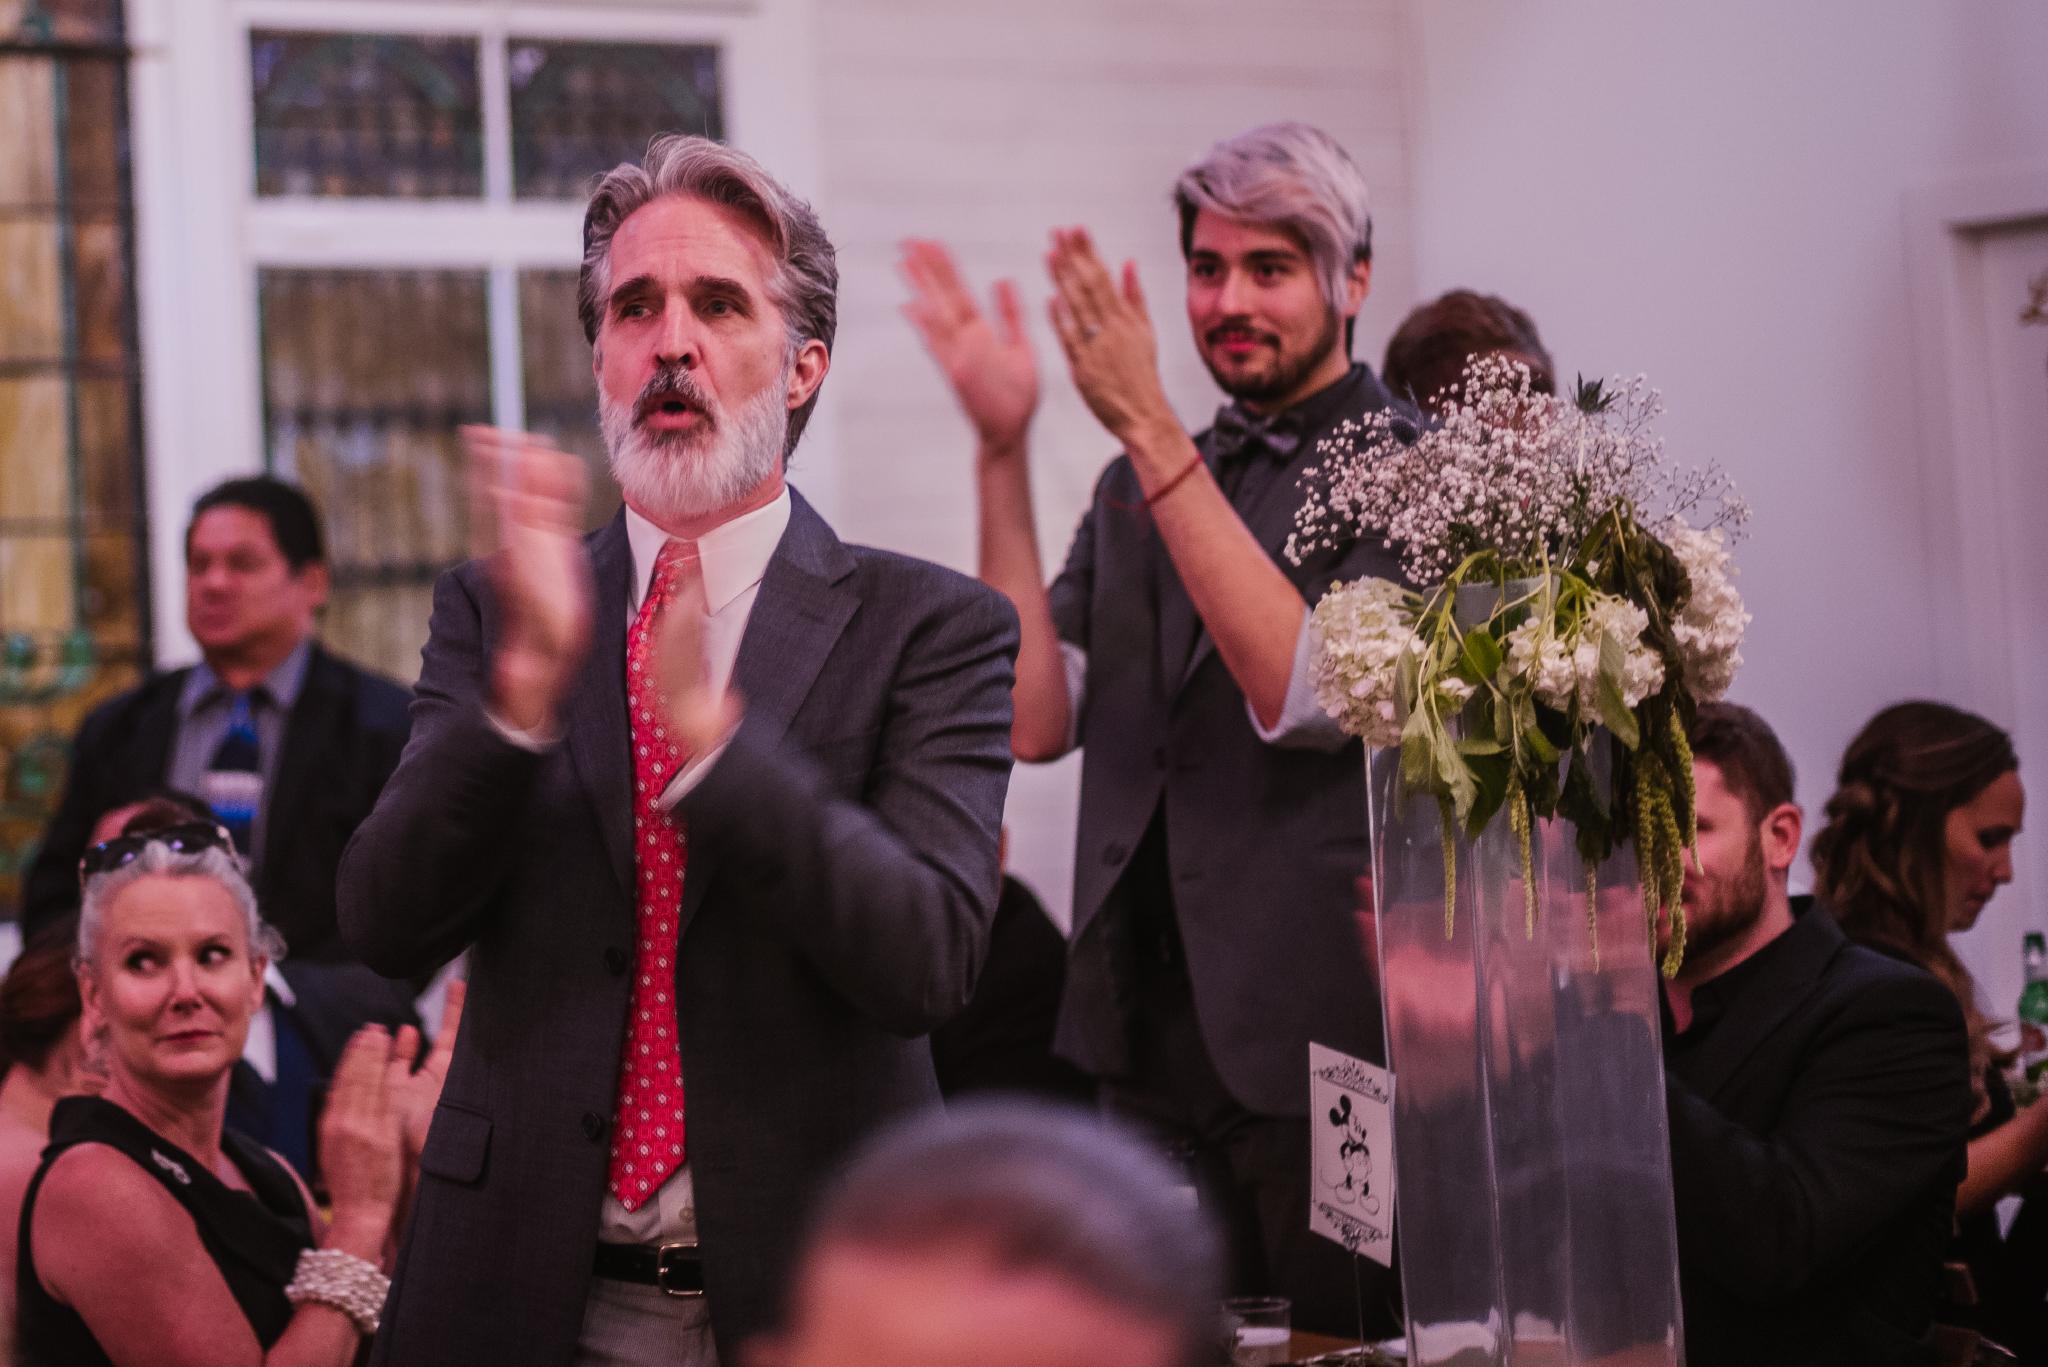 san diego wedding   photographer   men with white hair applauding